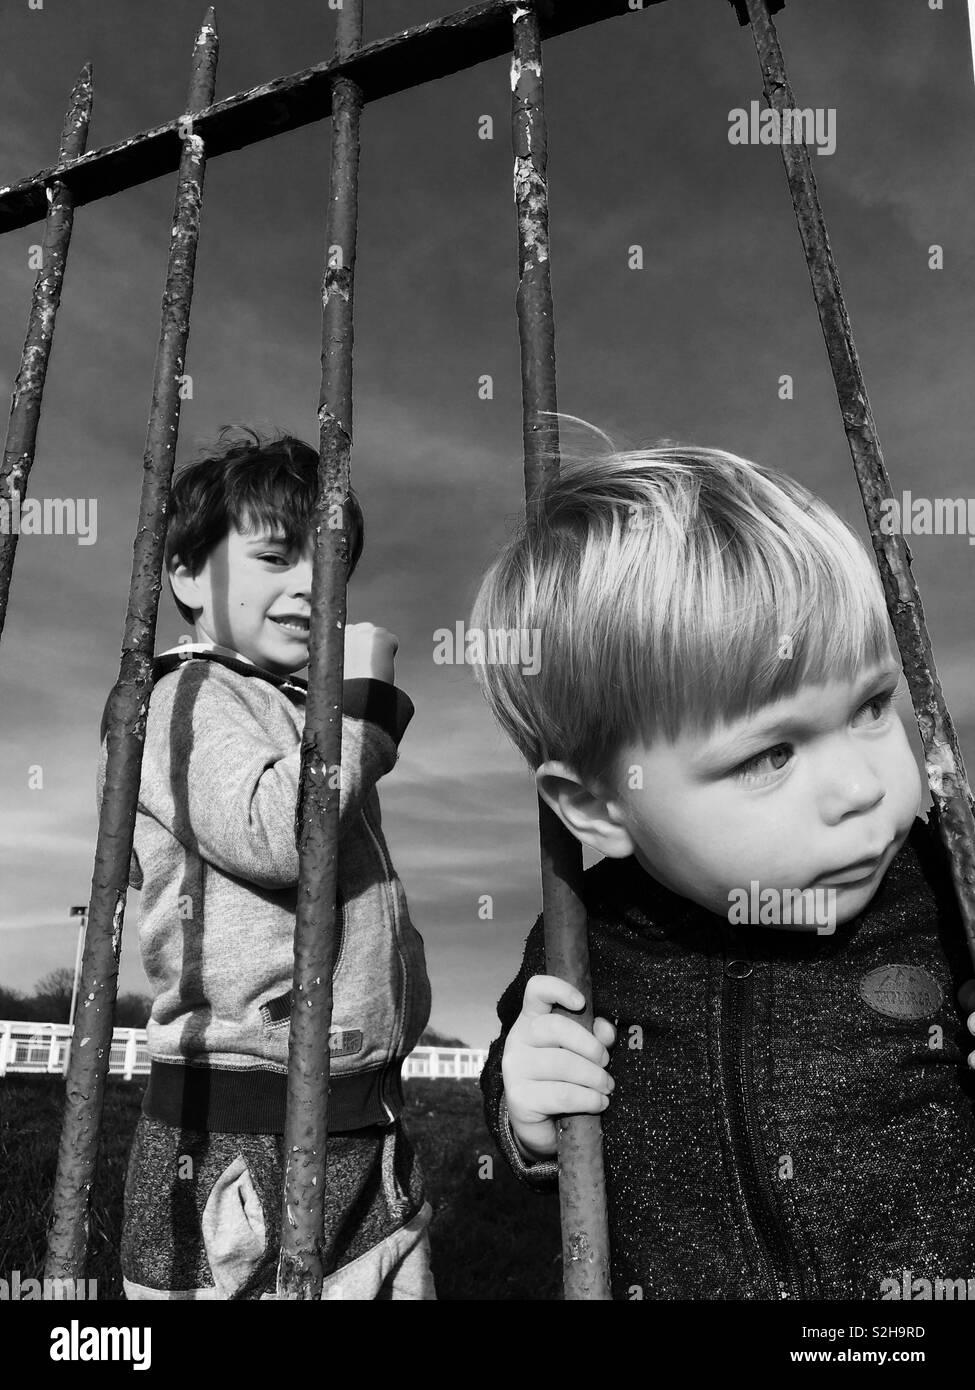 Coole kids Stockfoto